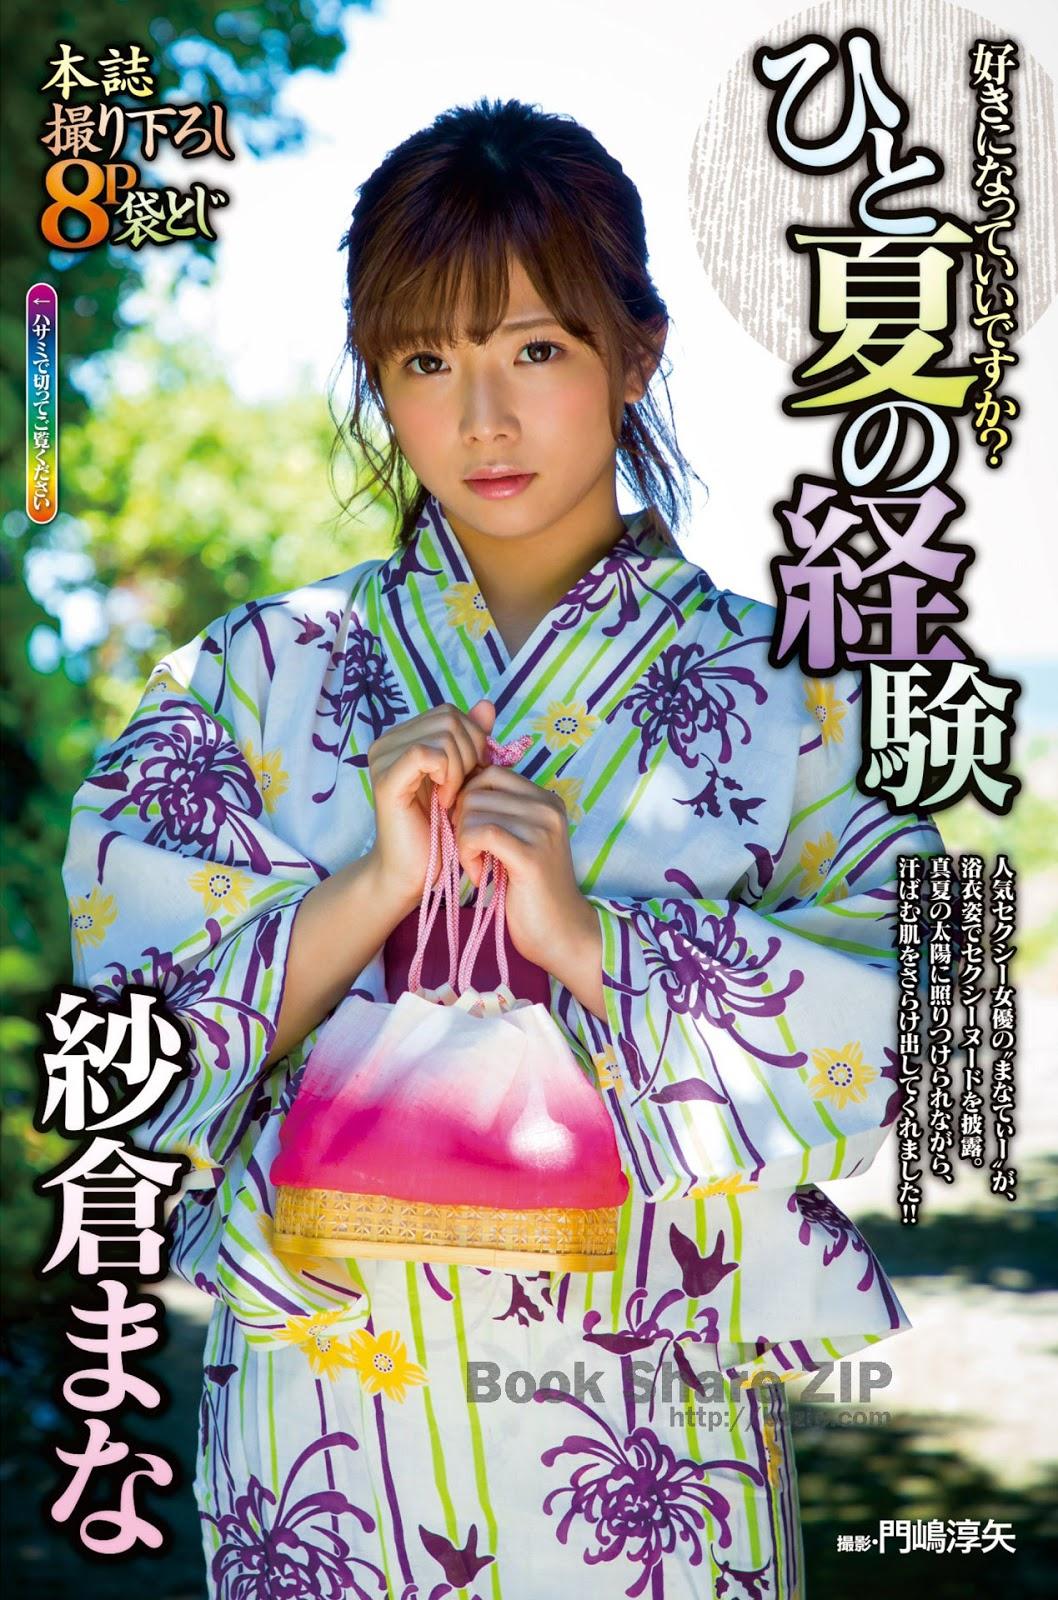 Mana Sakura 紗倉まな, Shukan Jitsuwa 2017.8.24 (週刊実話 2017年8月24日号)